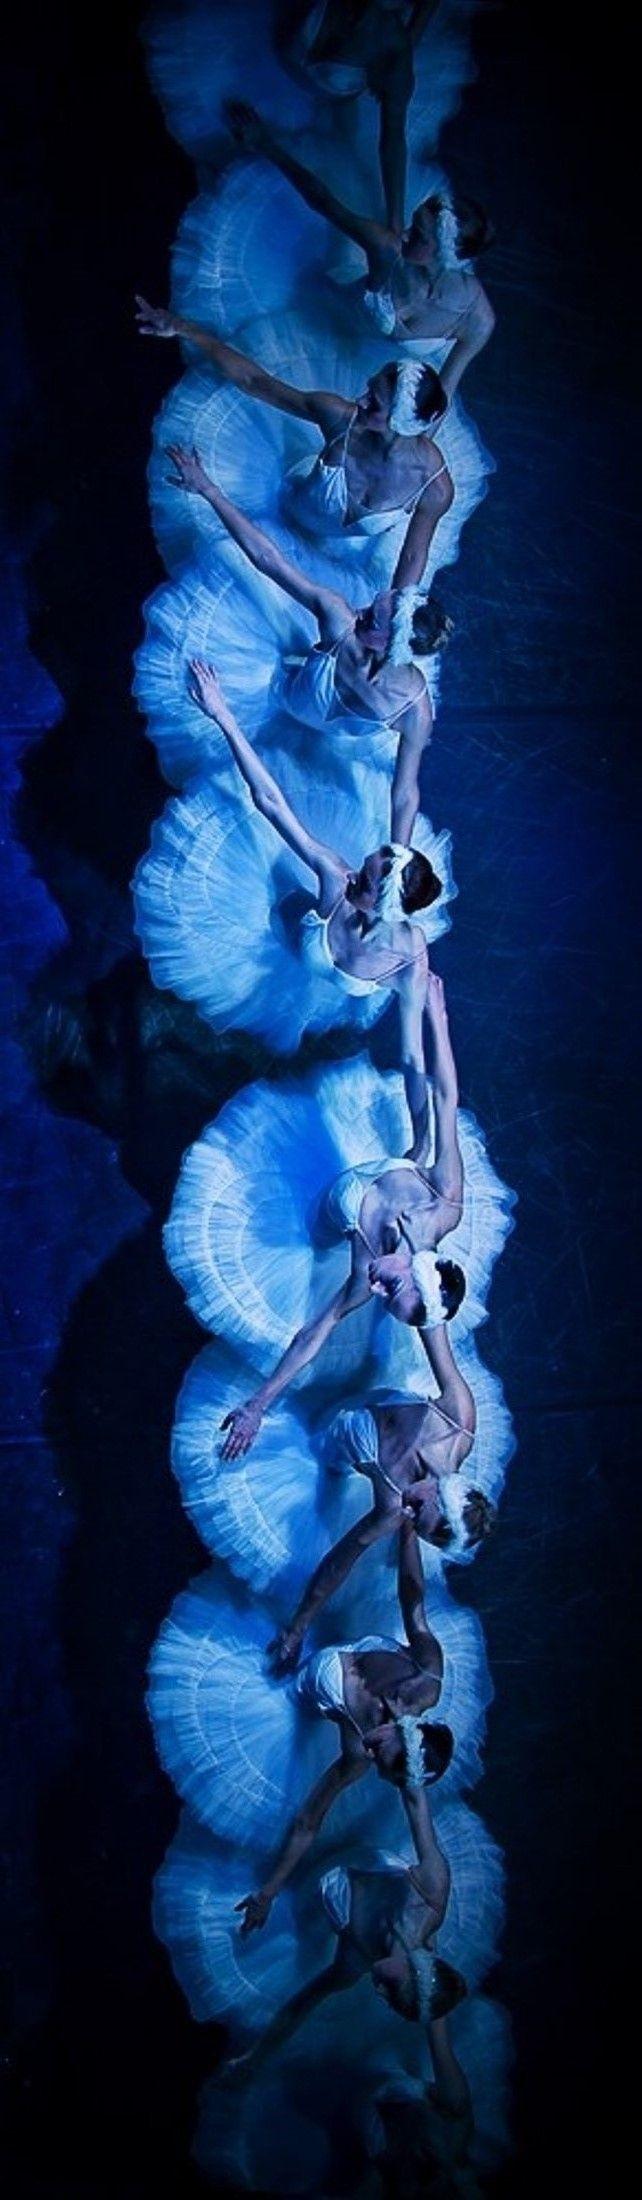 """El lago de los cisnes"", Mijailovski Ballet - Nikolay Krusser"